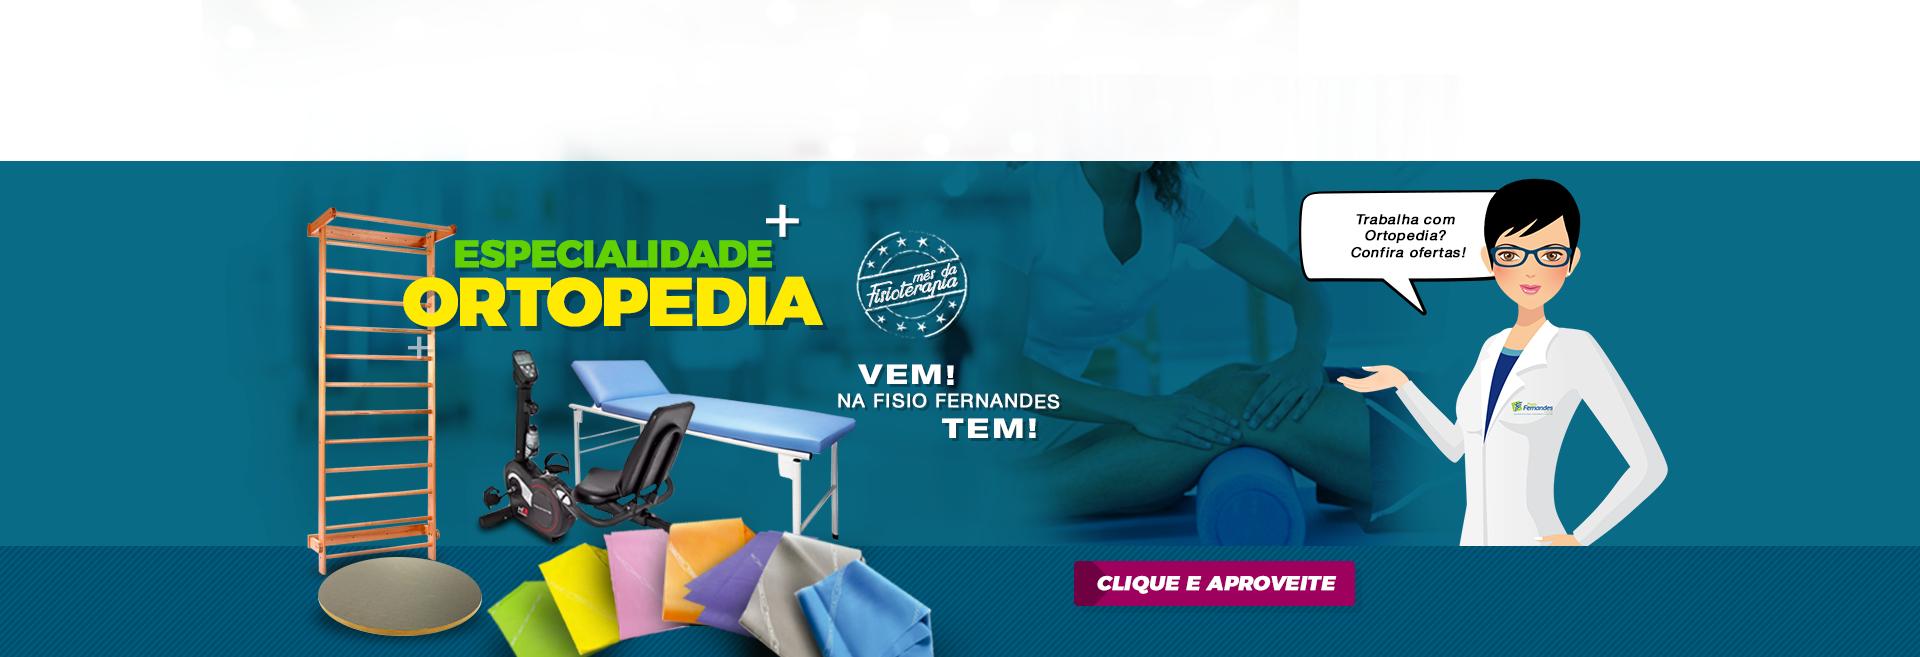 campanha especialidades- ortopedia